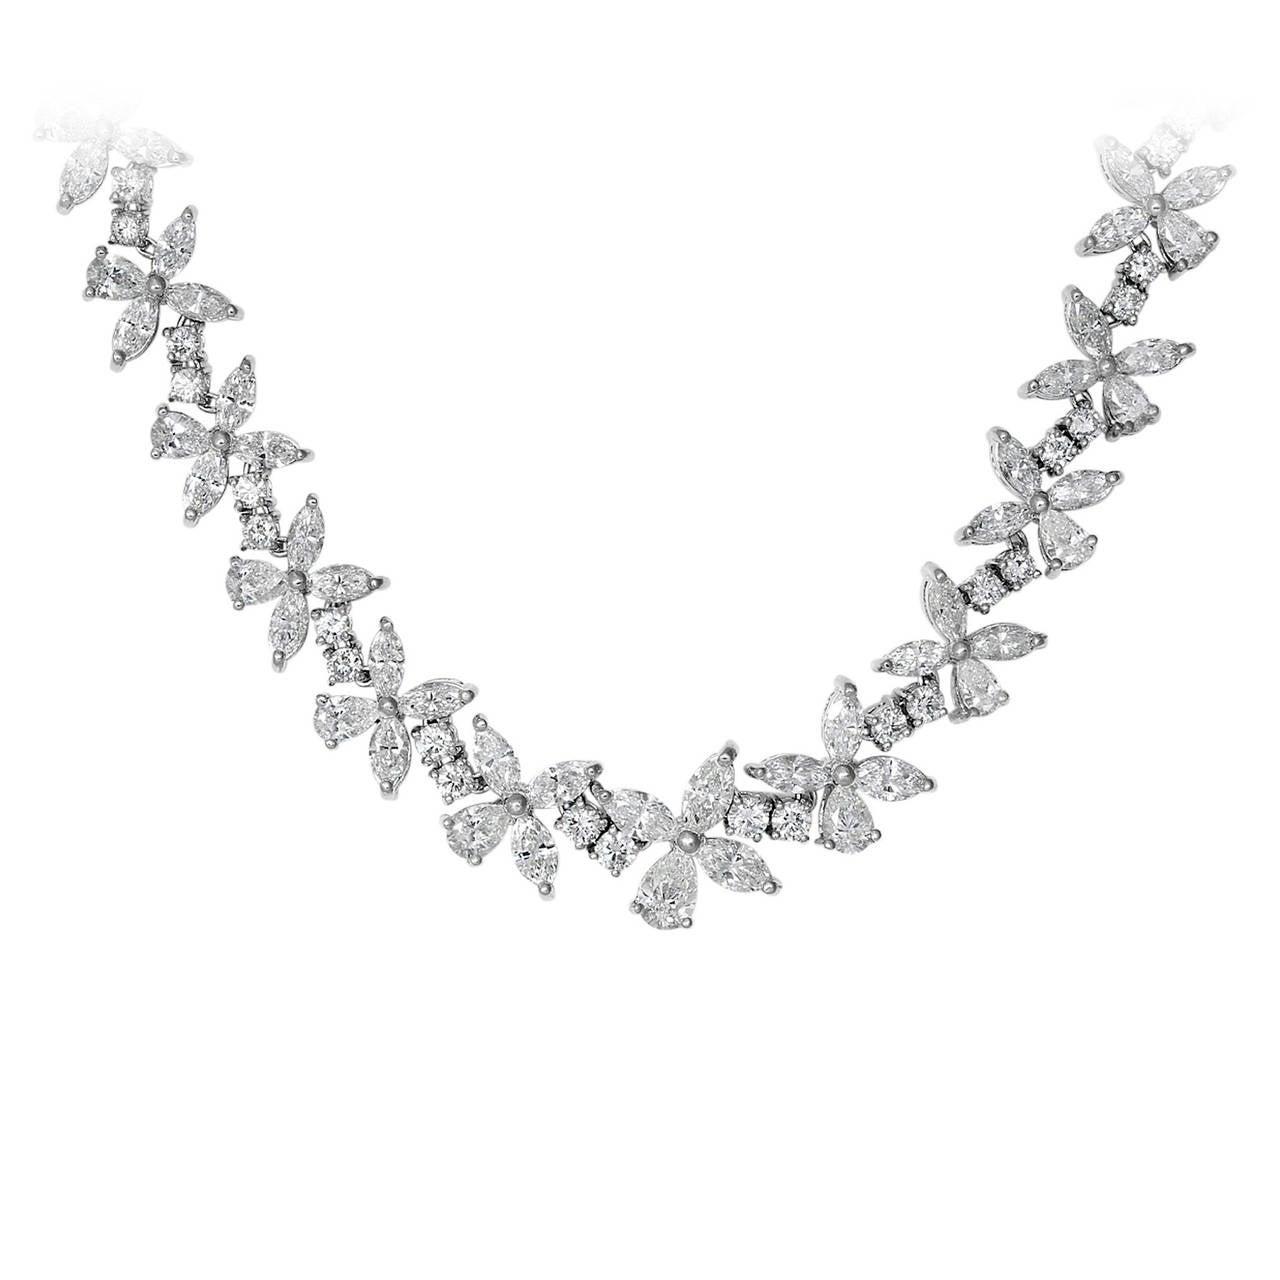 40.46 Carat Fancy Shape Diamond Necklace